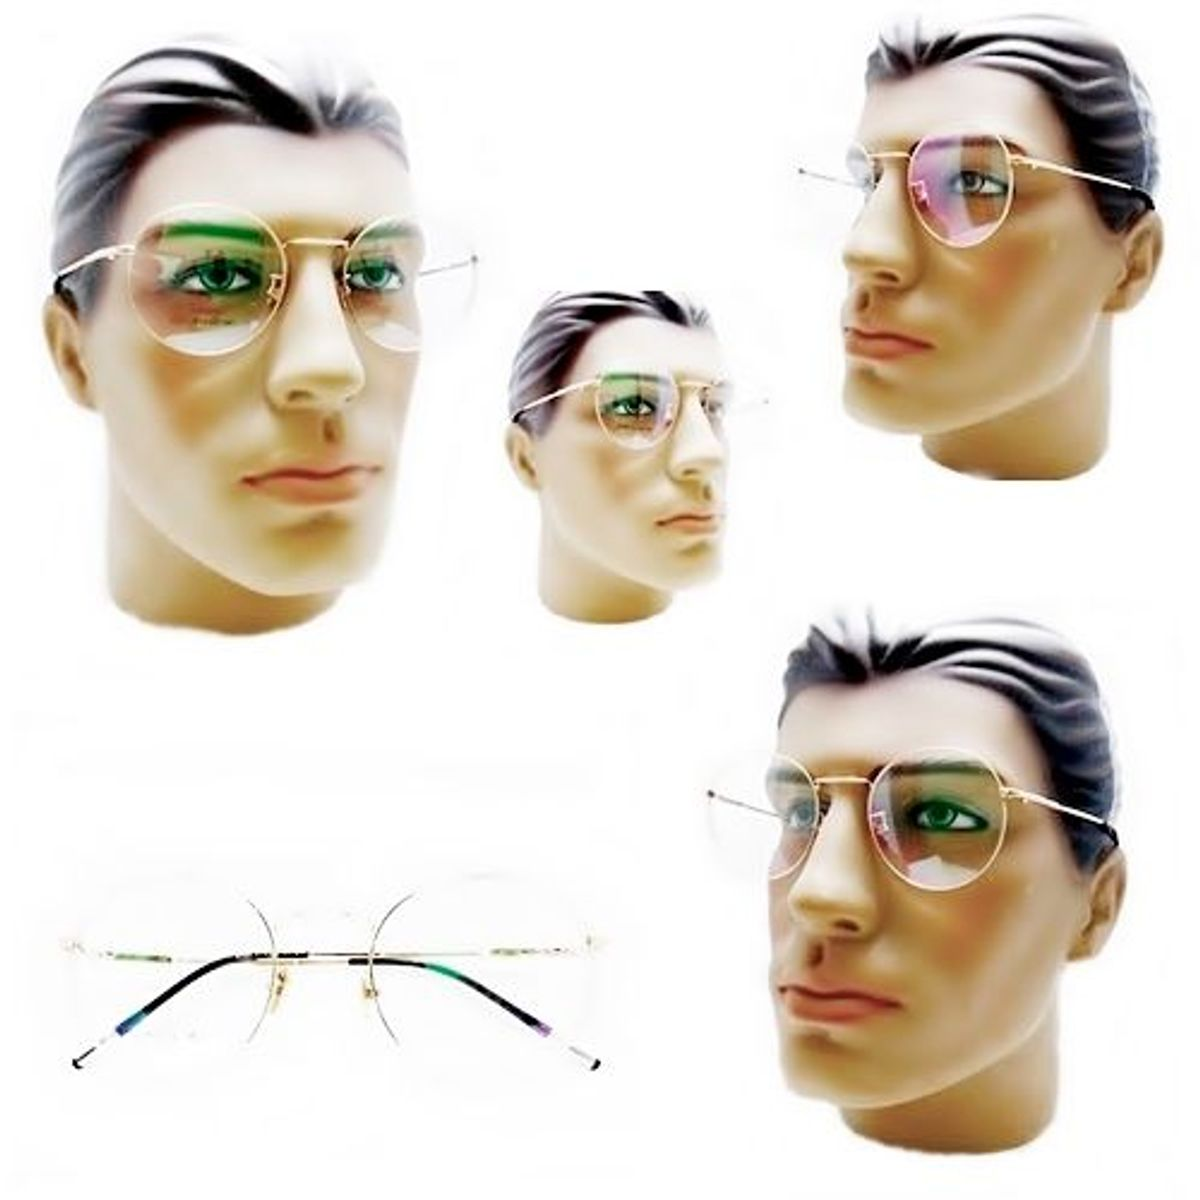 ad53f9c4a Armacao Oculos para Grau Masculino Redondo Retro Vintage Dourado | Óculos  Masculino Nunca Usado 32087314 | enjoei